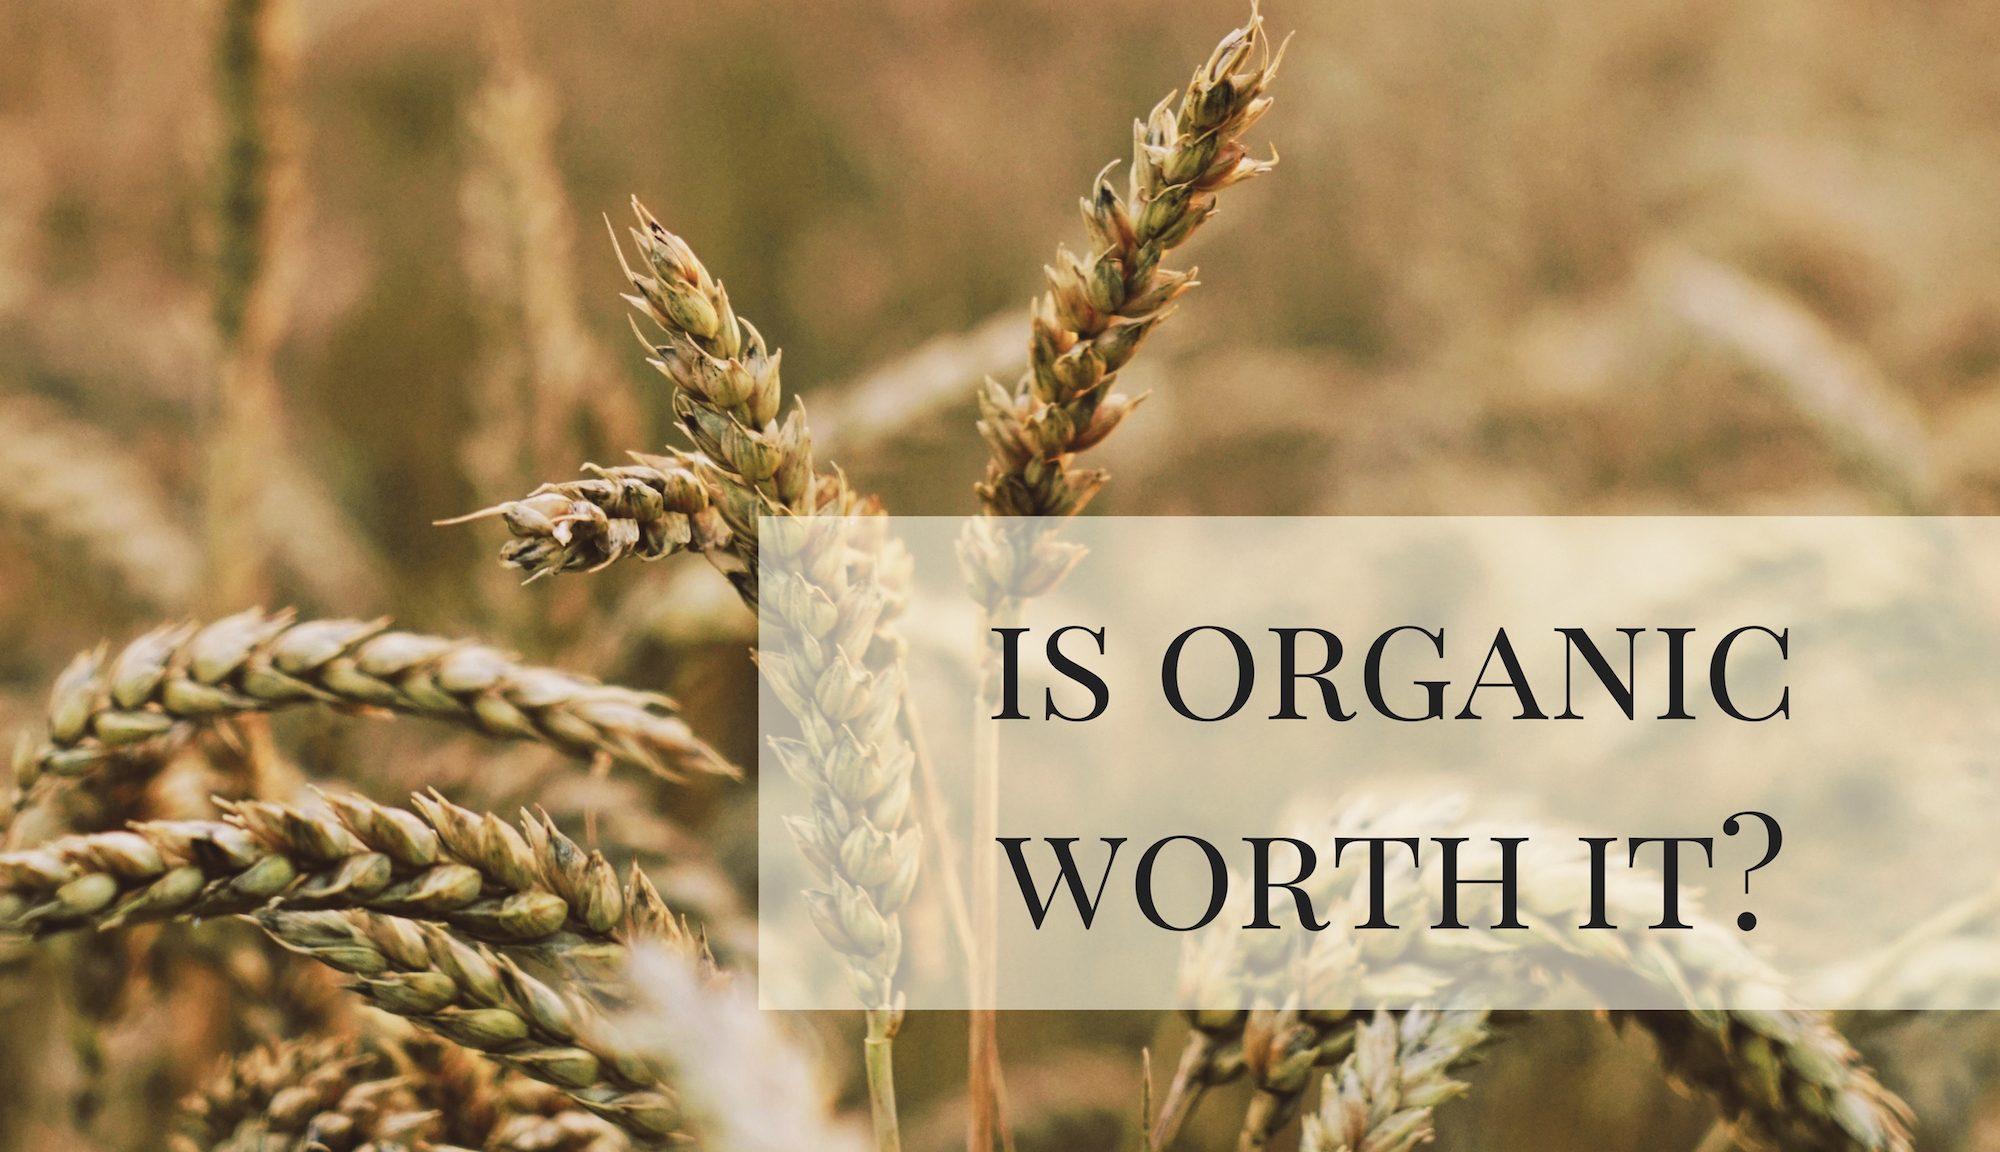 Is organic worth it